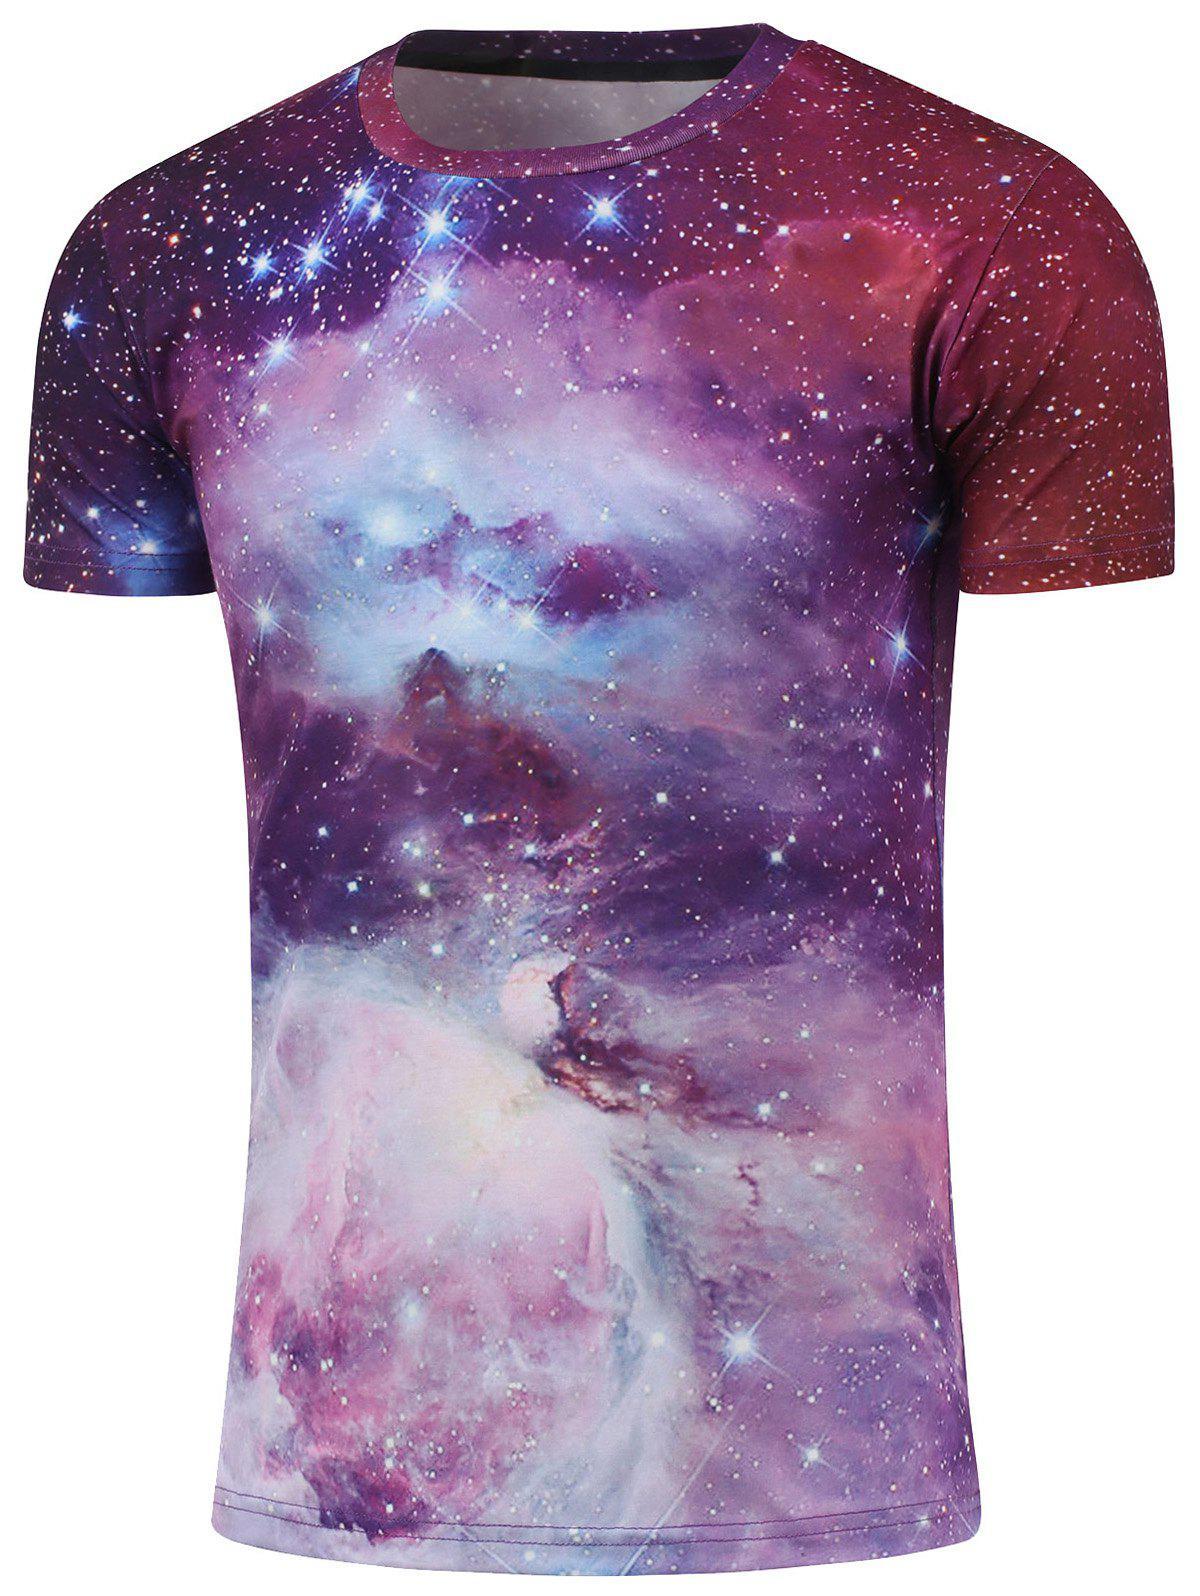 Ras du cou à manches courtes Galaxy T-shirt